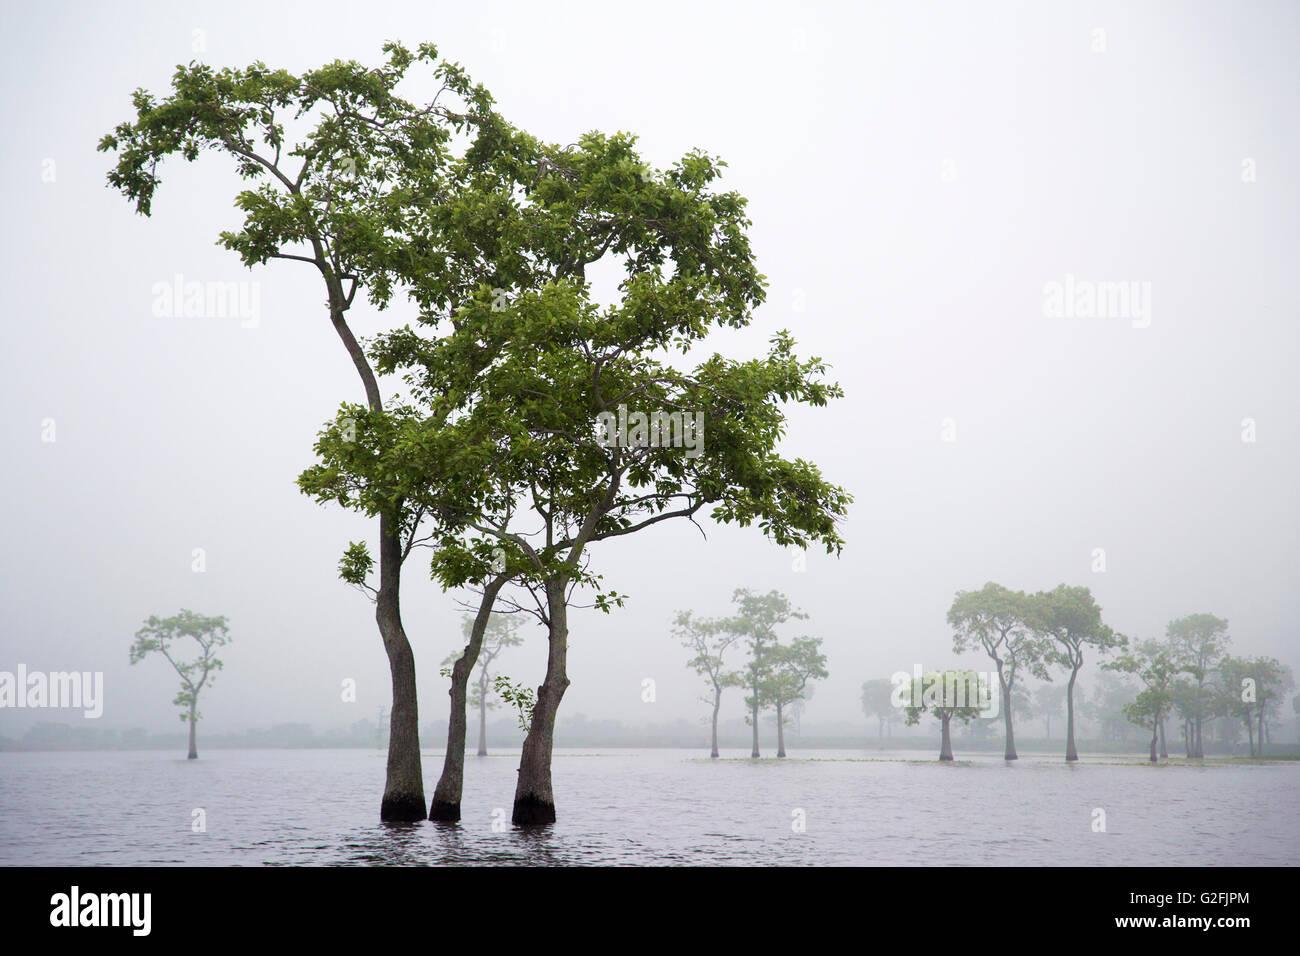 Tupelo trees (Nyssa aquatica) in morning mist at Miller's Lake - Stock Image